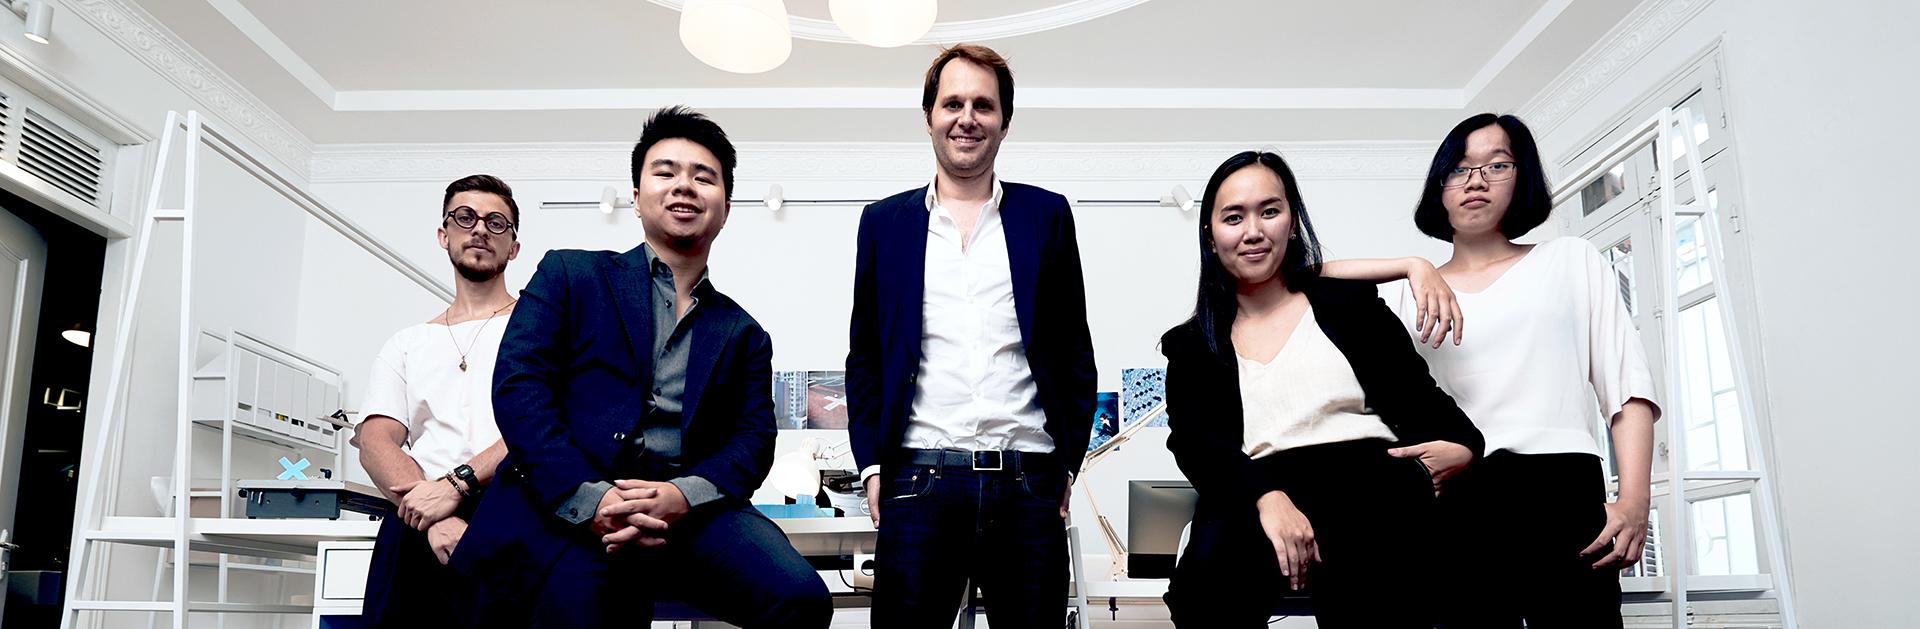 multiply office team_Julien Boulay, Quang Anh Ha, Nicolas Moser, Hamy Pham, Khanh Duong